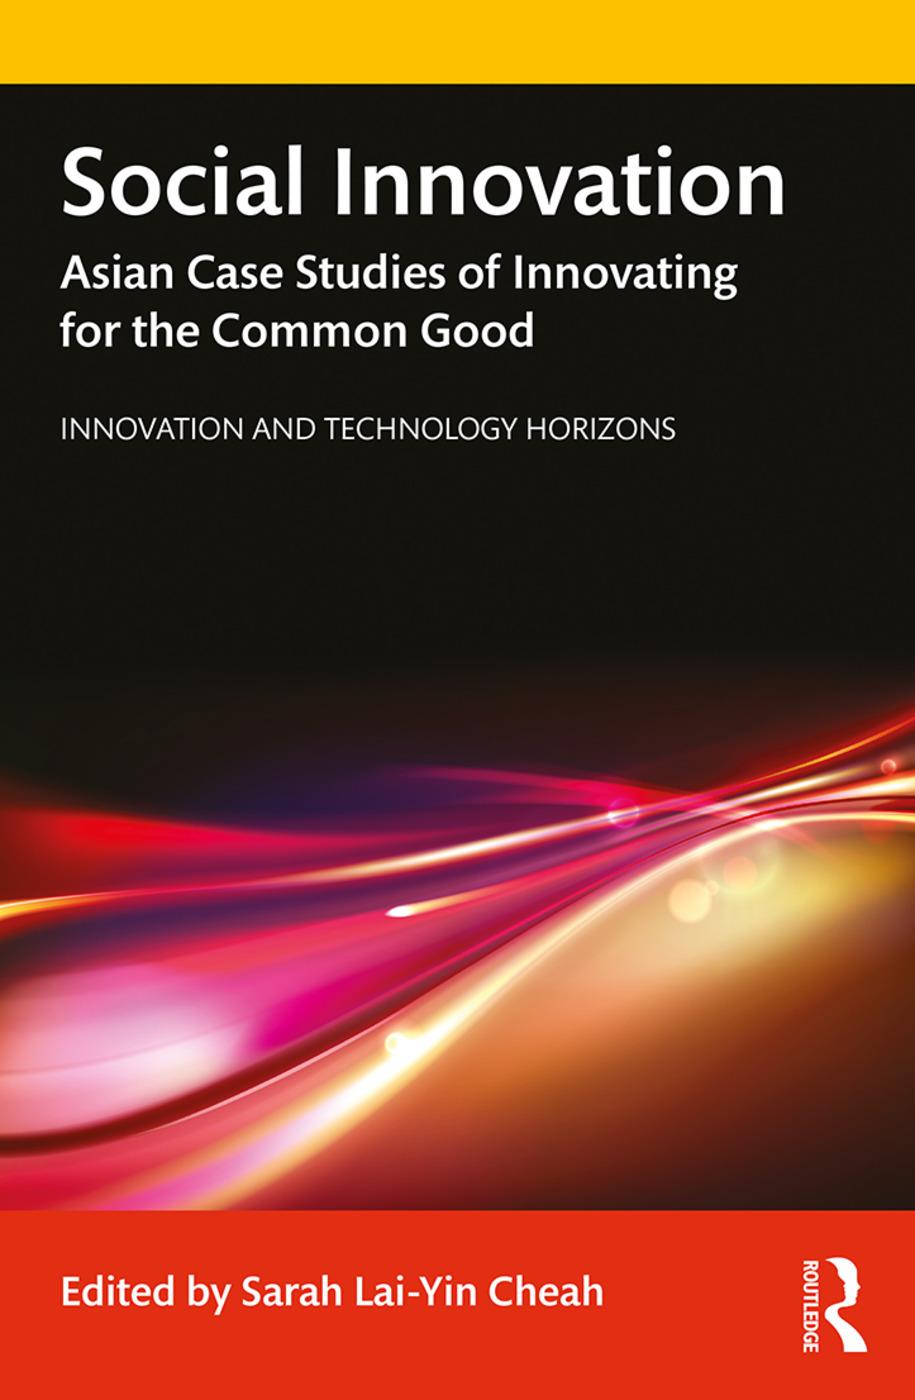 Social Innovation: Asian Case Studies of Innovating for the